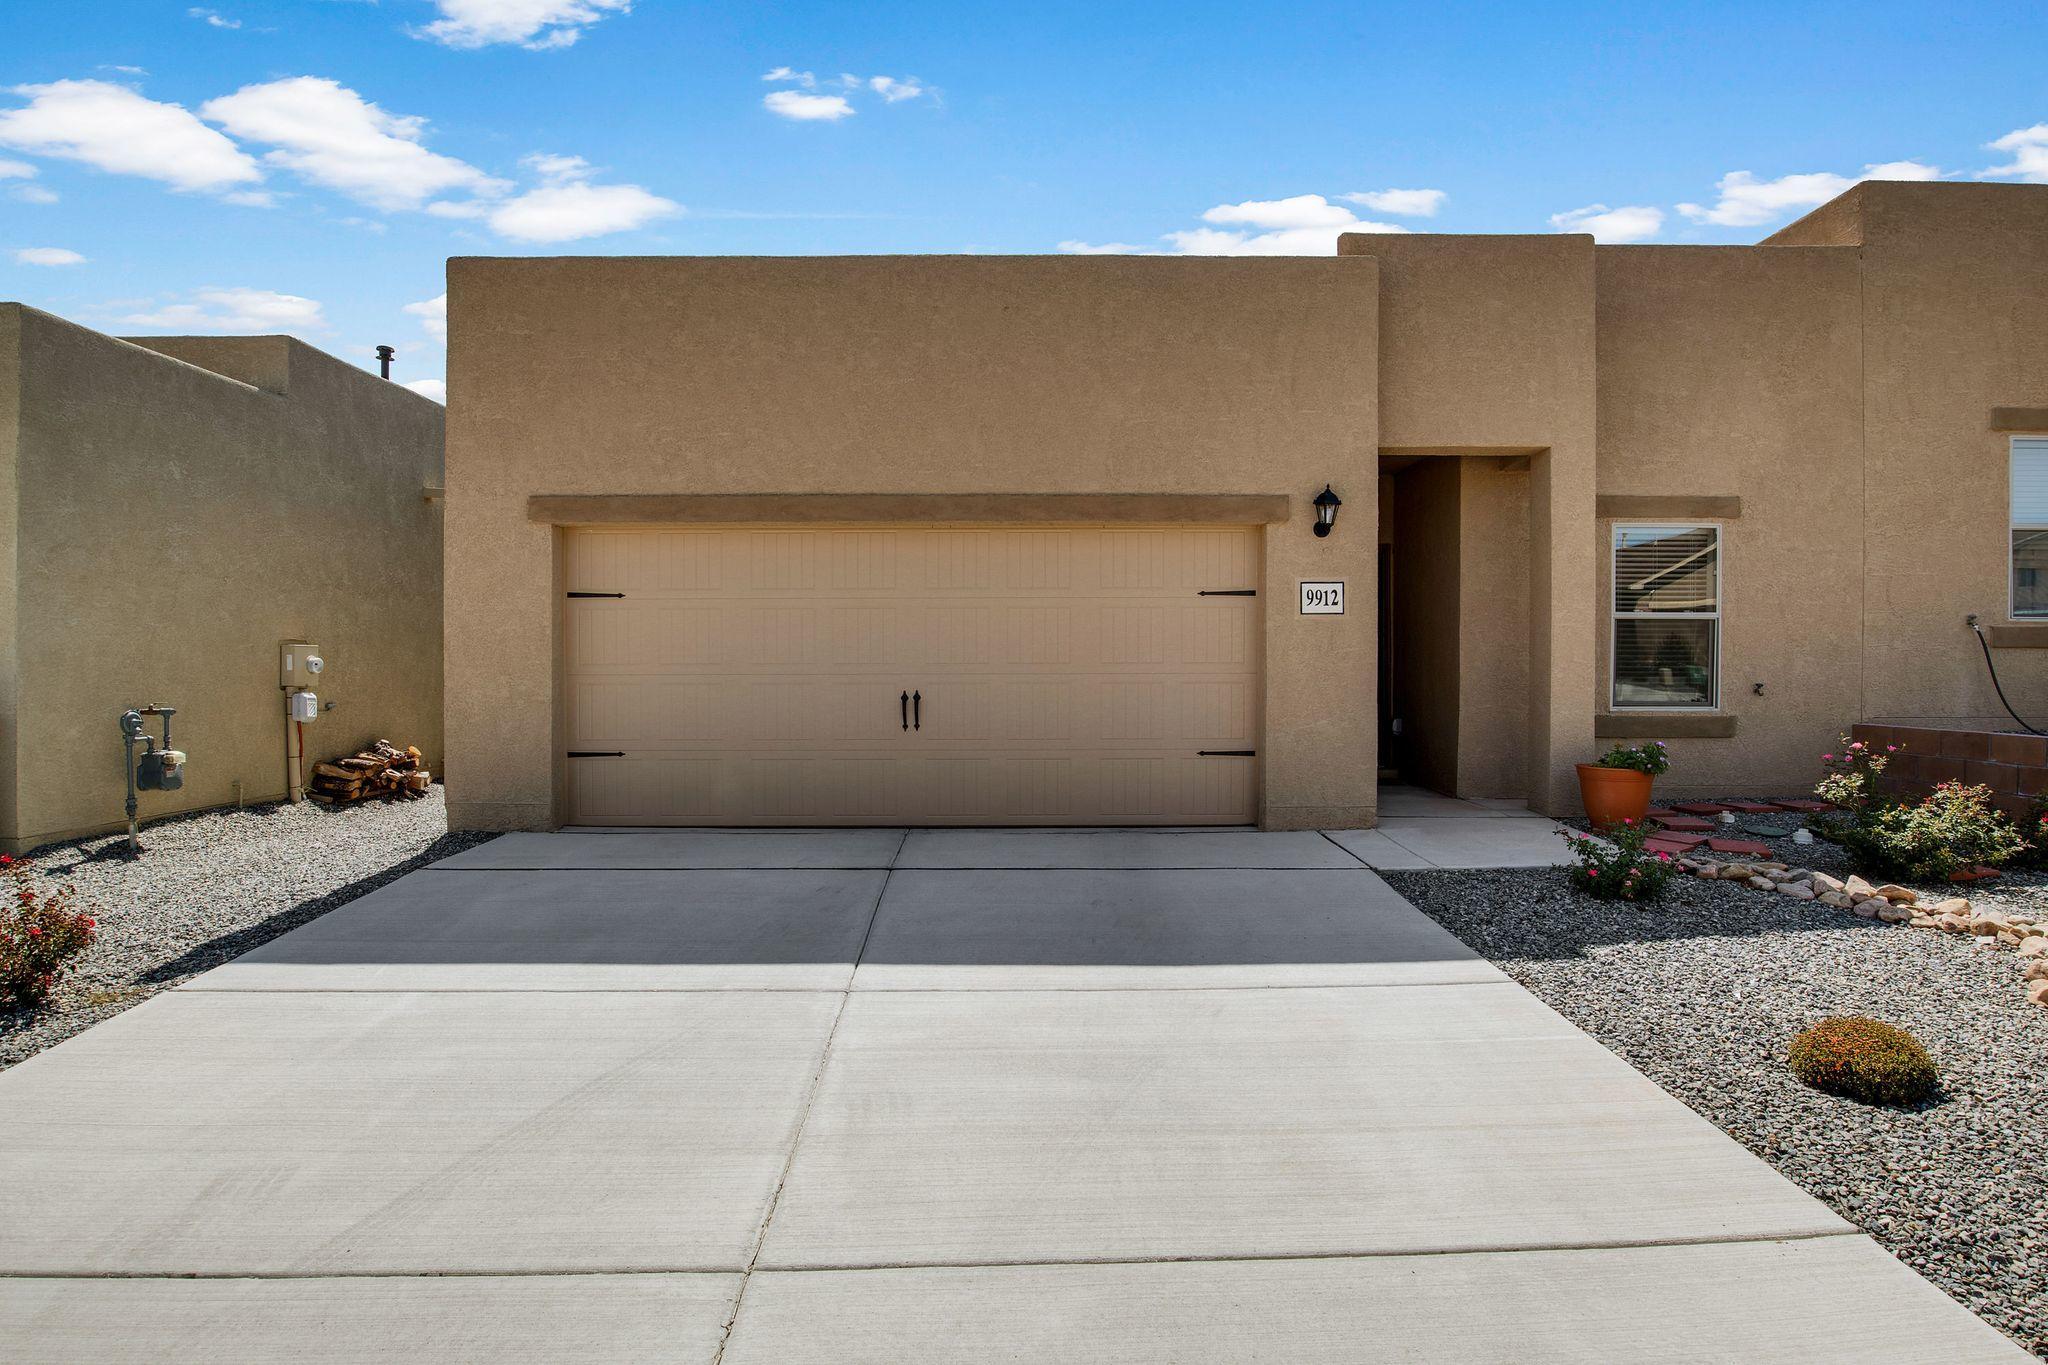 9912 SACATE BLANCO Avenue, Albuquerque NM 87121